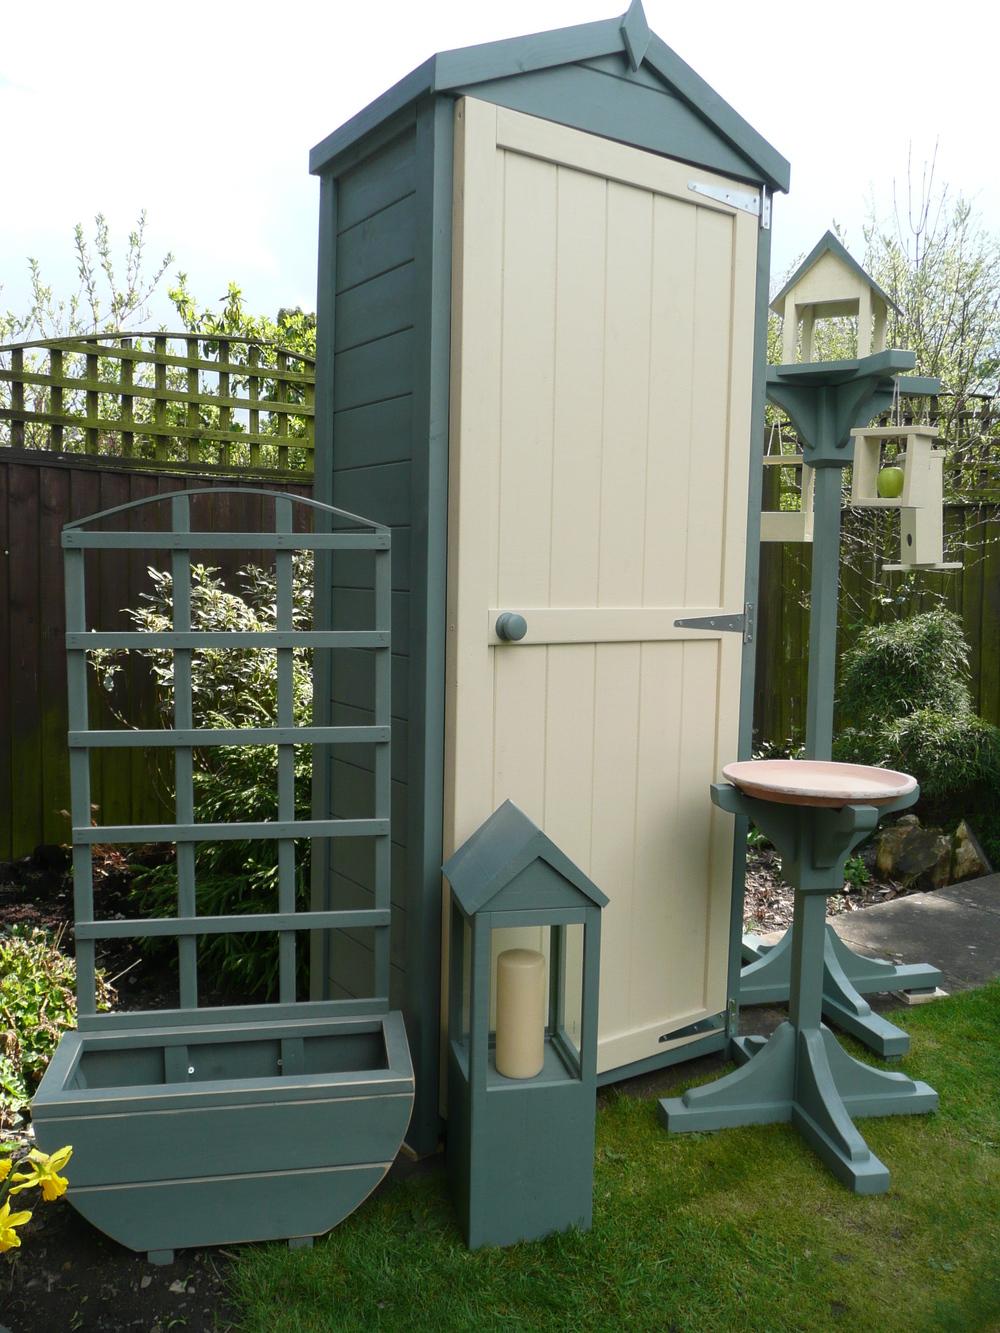 Sentry Box Sentry Box Style Garden